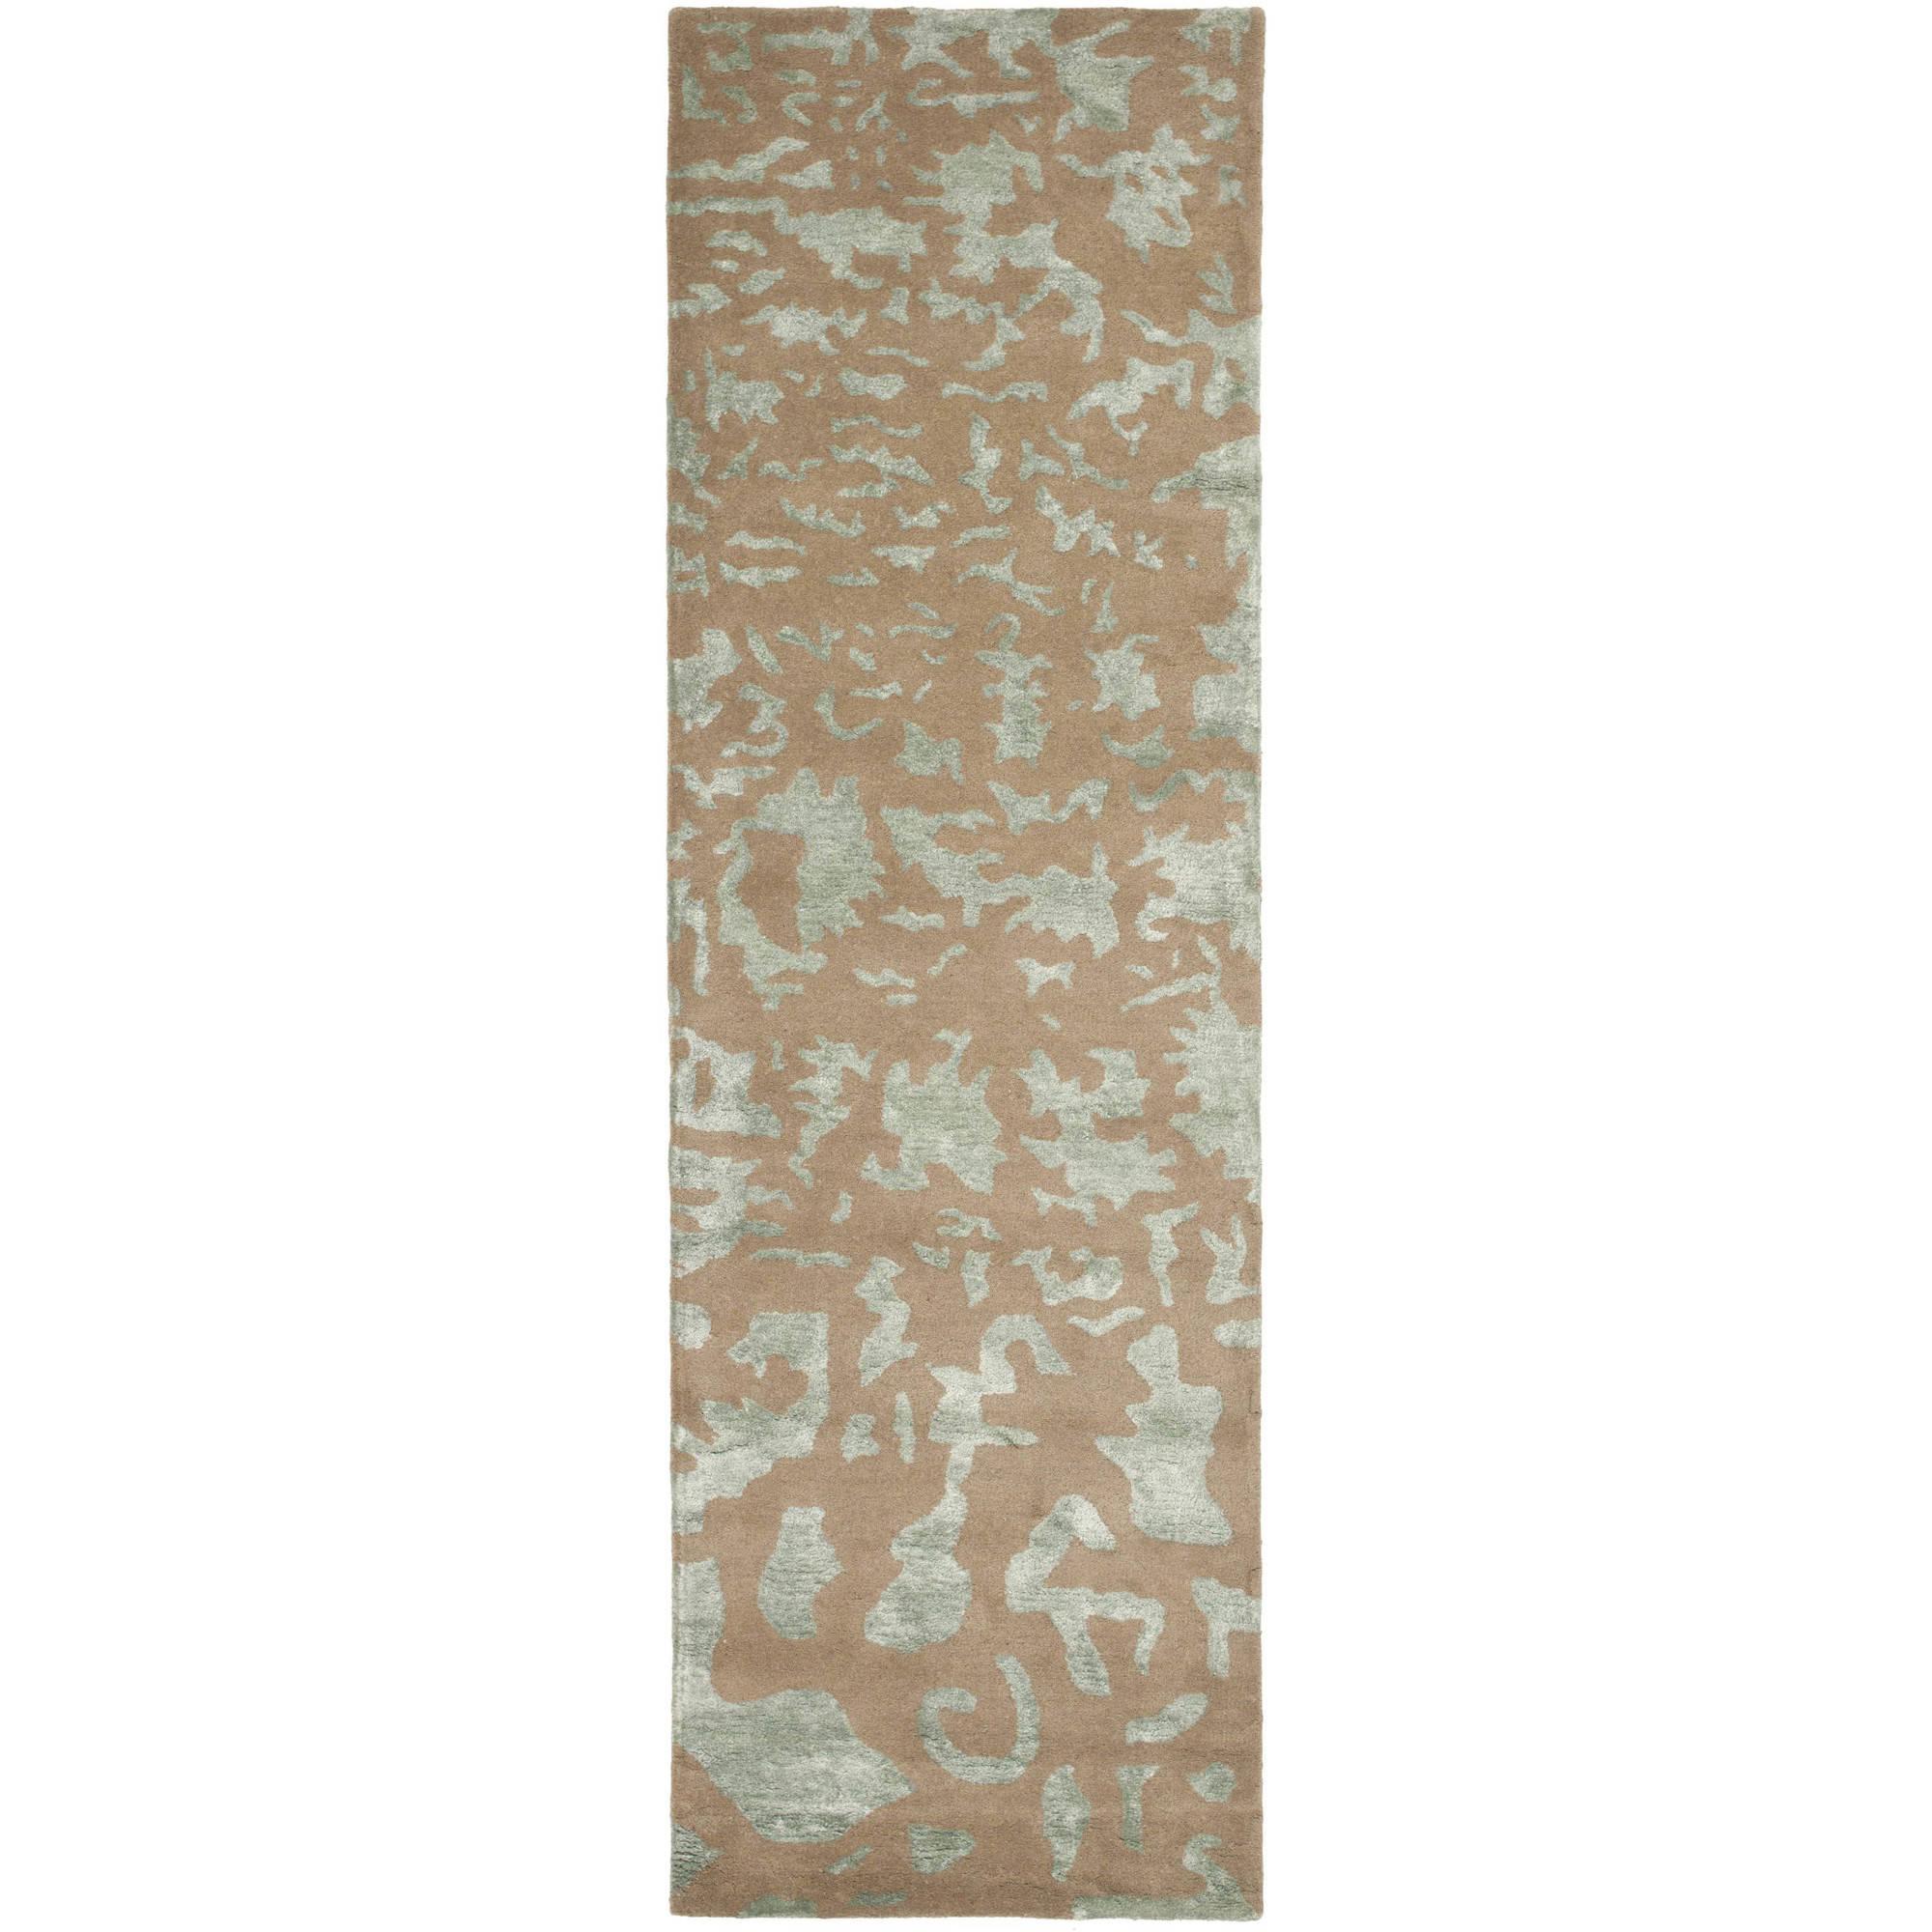 Safavieh Hand-Tufted Wool Runner Rug